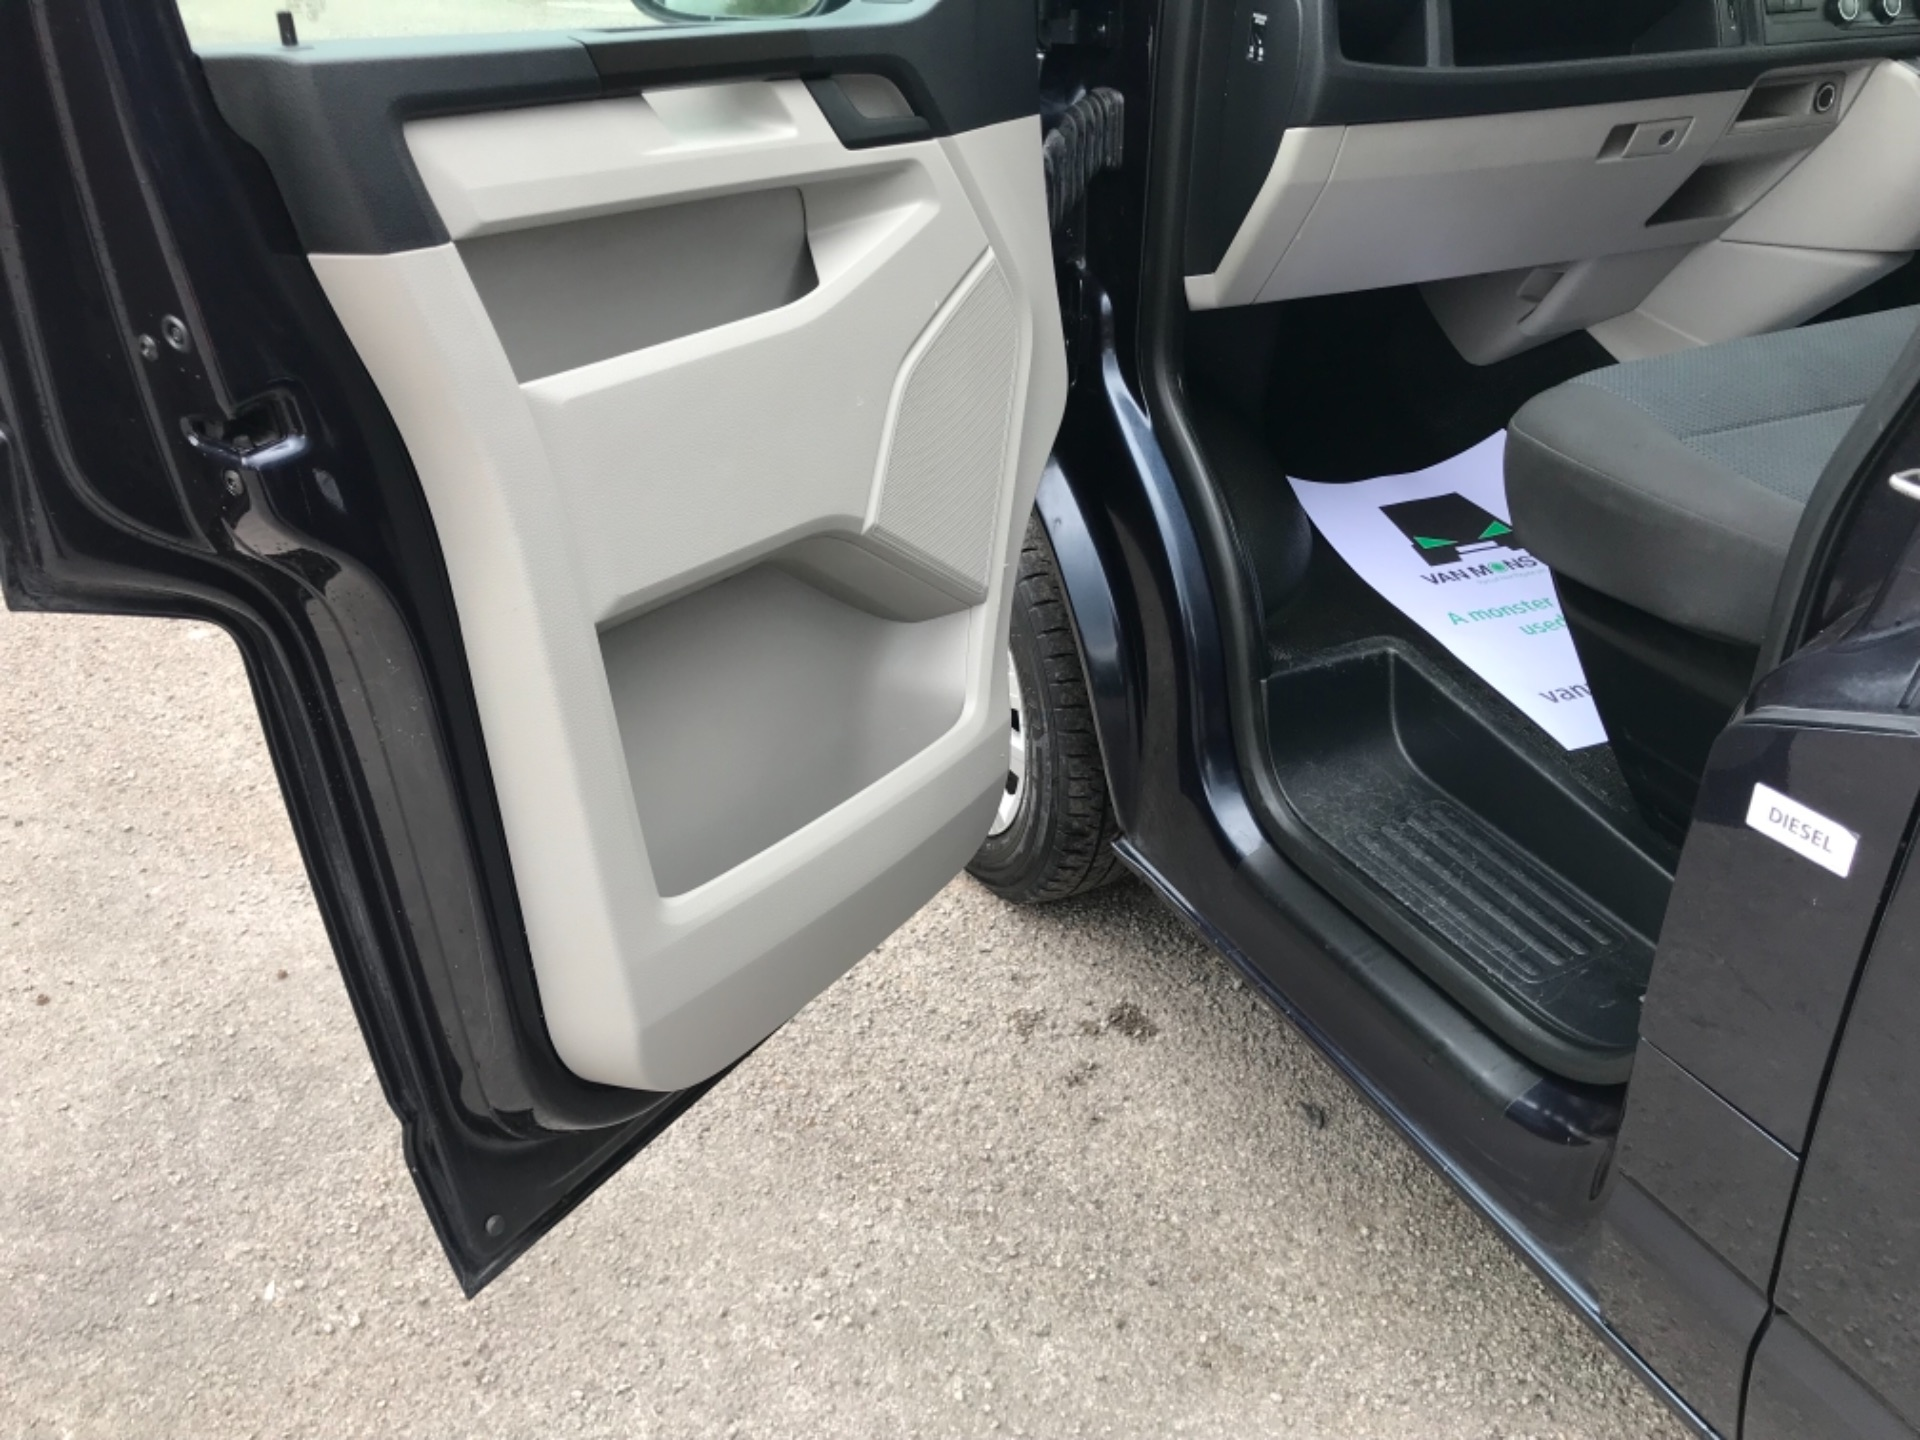 2019 Volkswagen Transporter 2.0 Tdi Bmt 150 Highline Van EURO 6 (GX69ZSN) Image 28